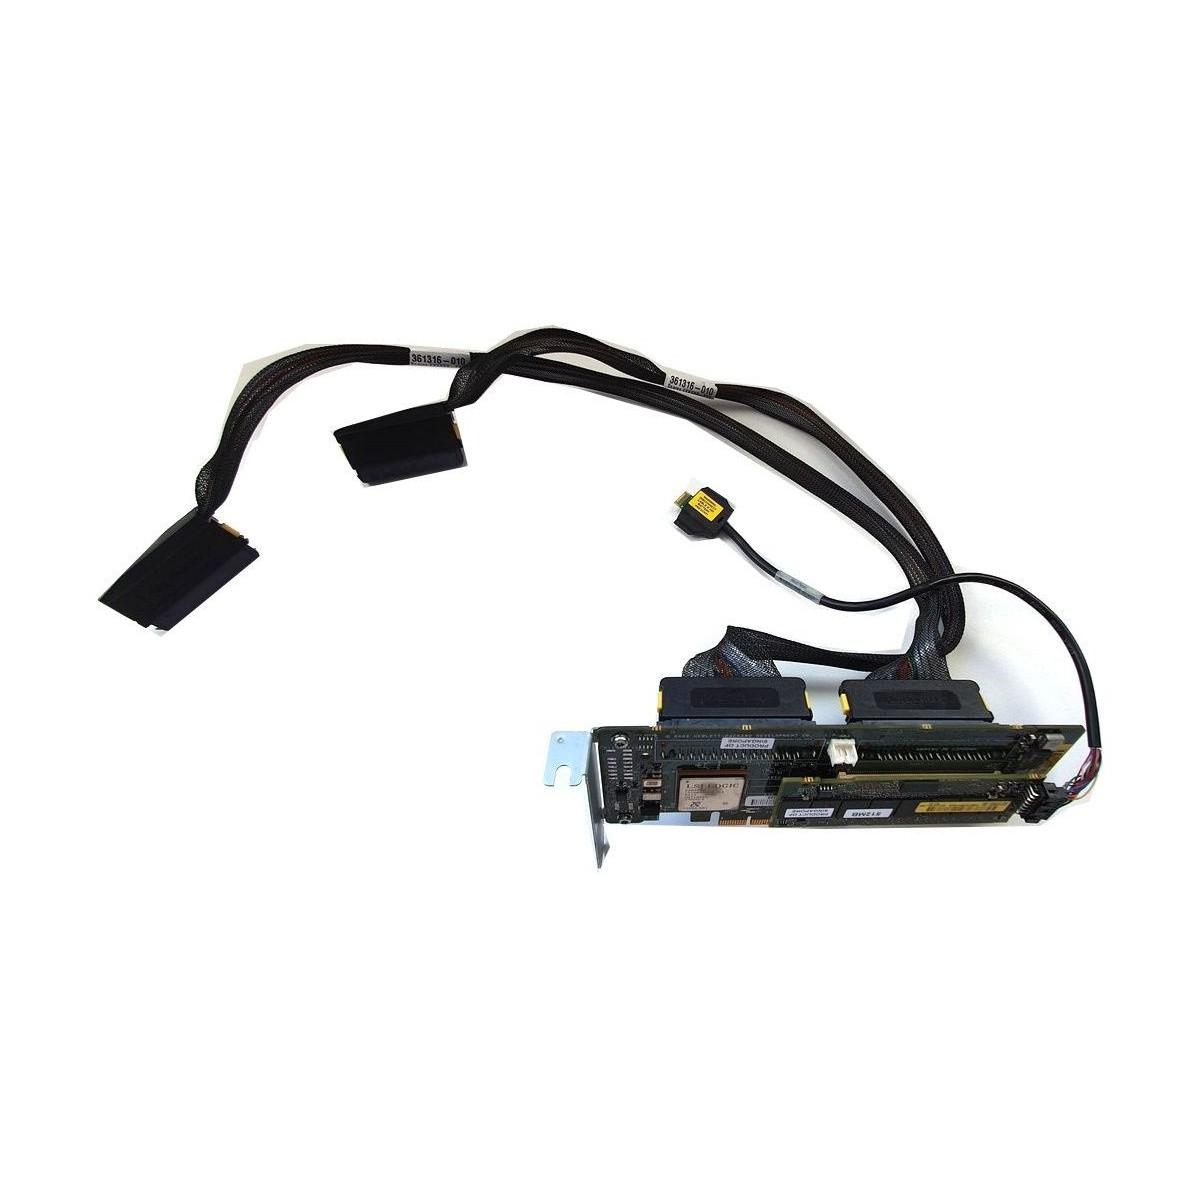 DYSK HP 146GB SCSI 15K U320 80p 3,5 RAMKA 404712-001